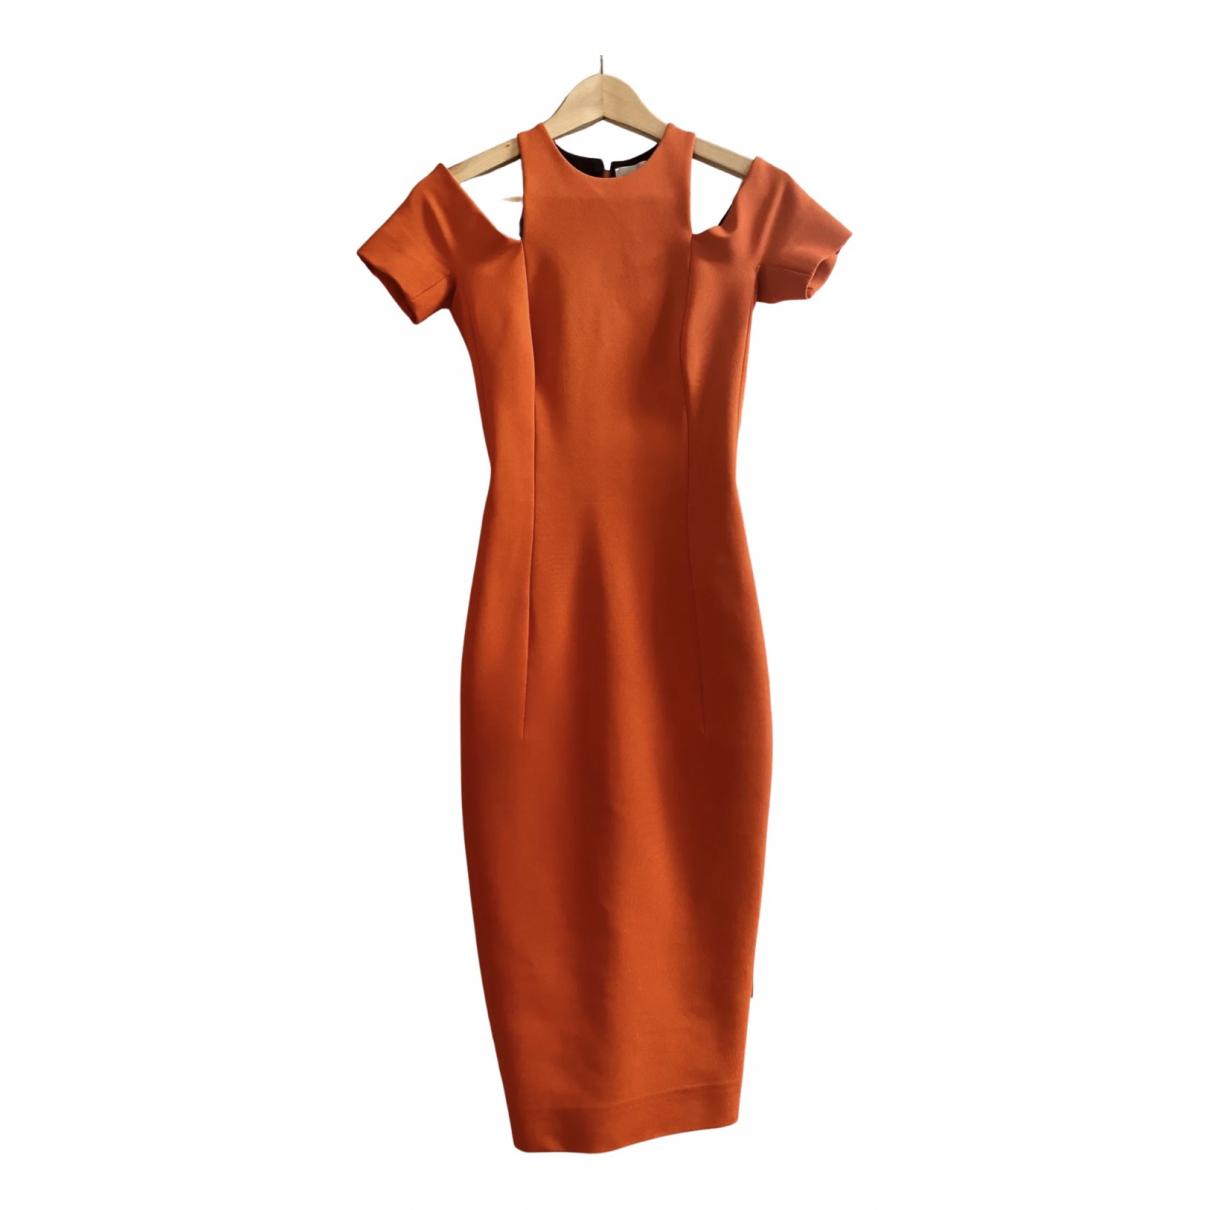 Victoria Beckham N Orange Cotton - elasthane dress for Women 6 UK